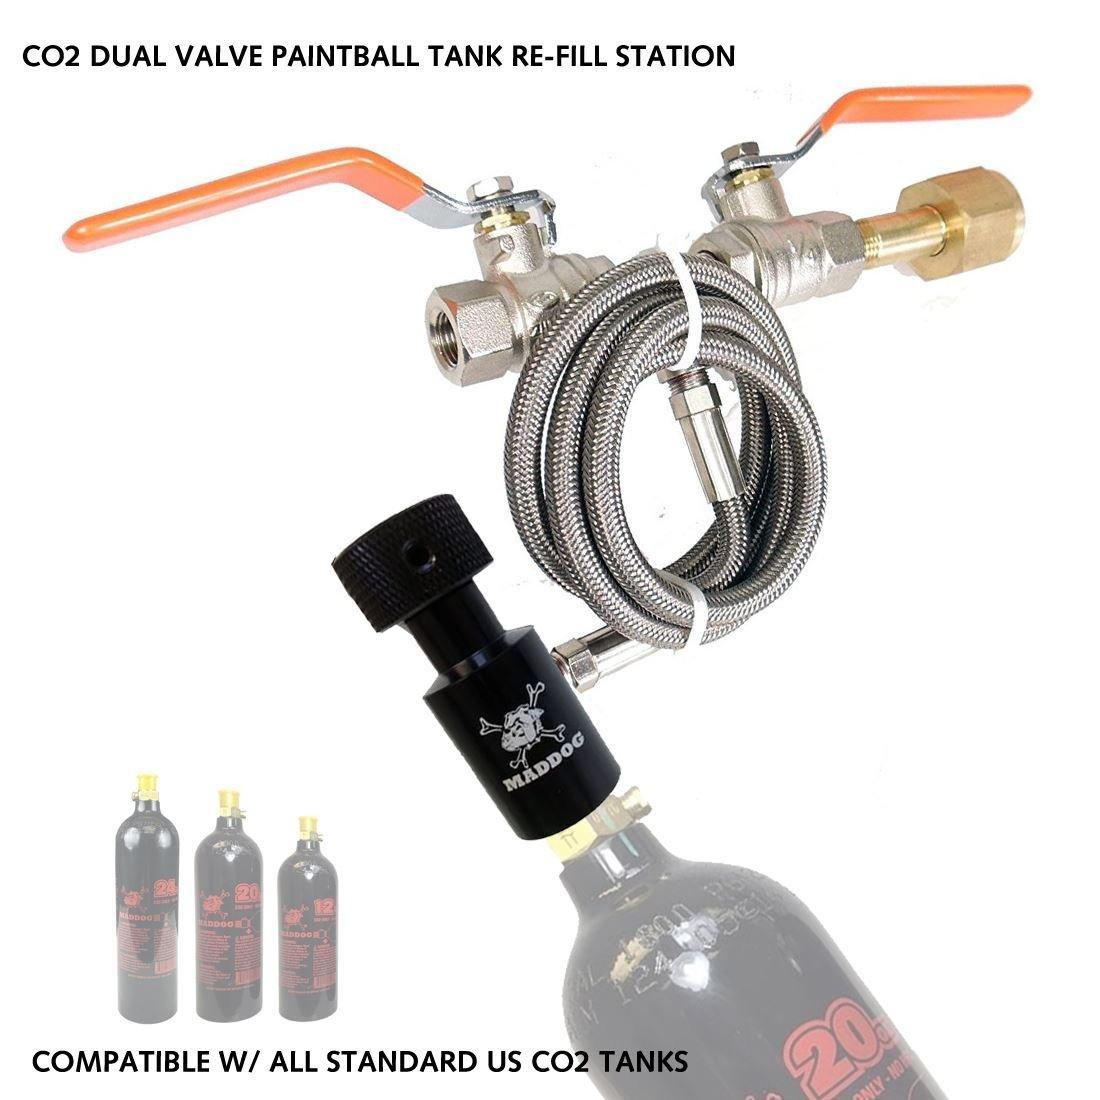 Buy Milwaukee Instruments MA957 Dual-Valve CO2 Adjustable